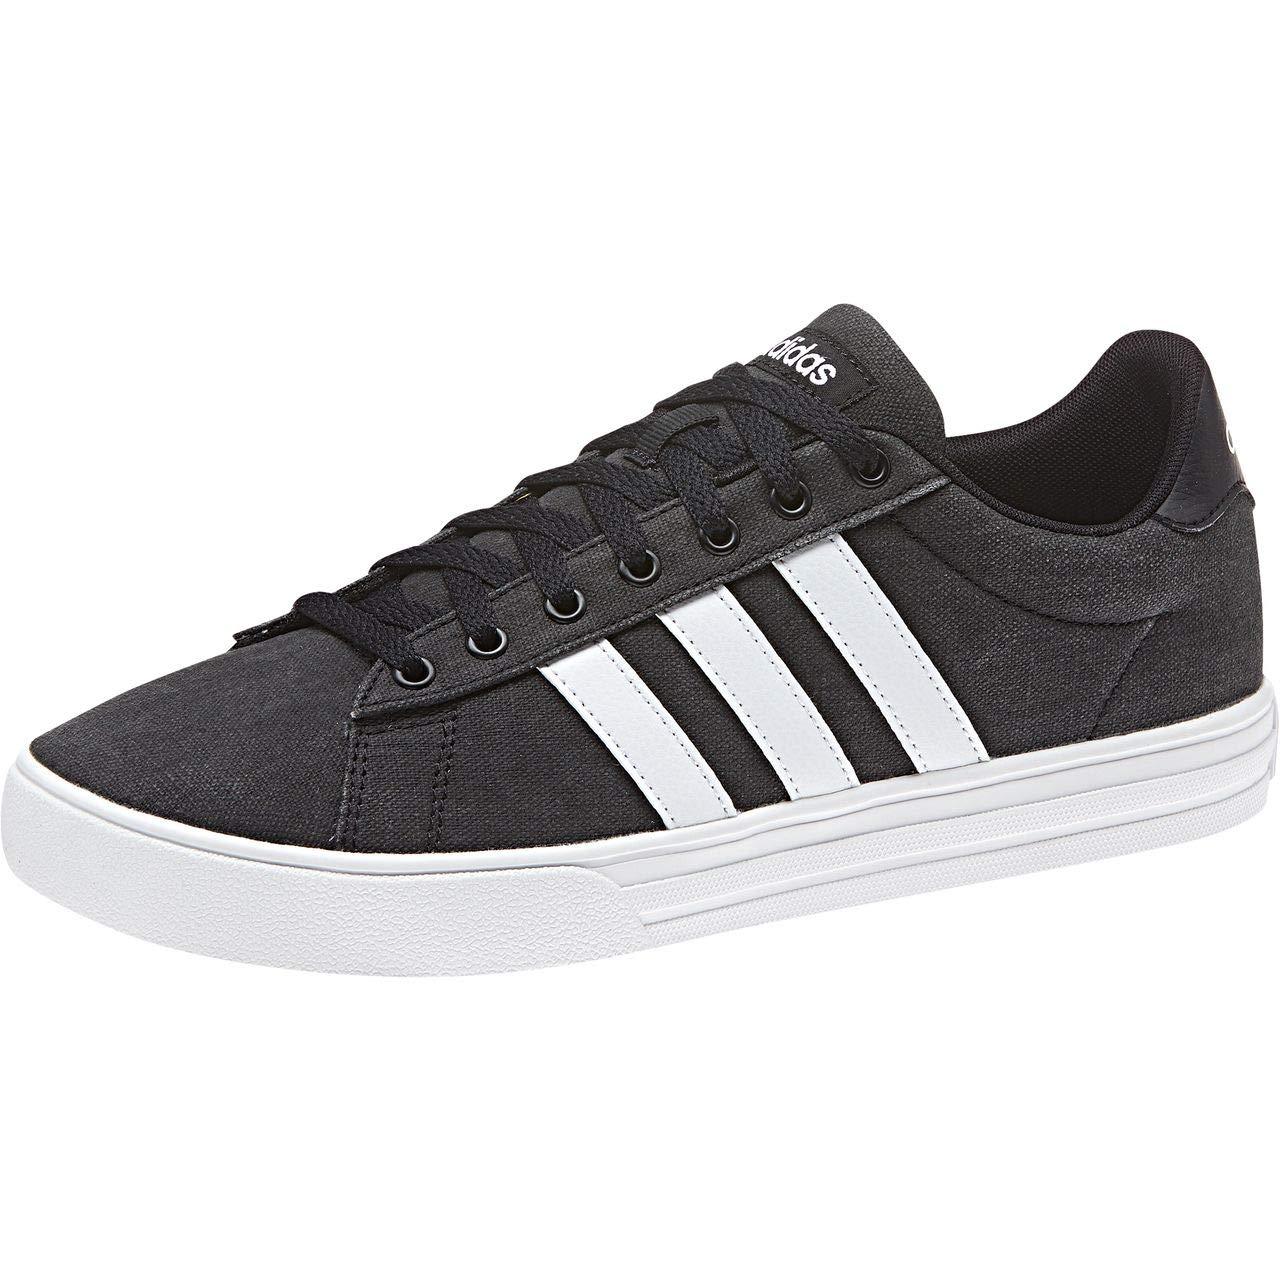 Adidas Herren Daily 2.0 Fitnessschuhe, Schwarz Ftwbla Ftwbla Ftwbla Negbás 000, 47 1 3 EU be02d1